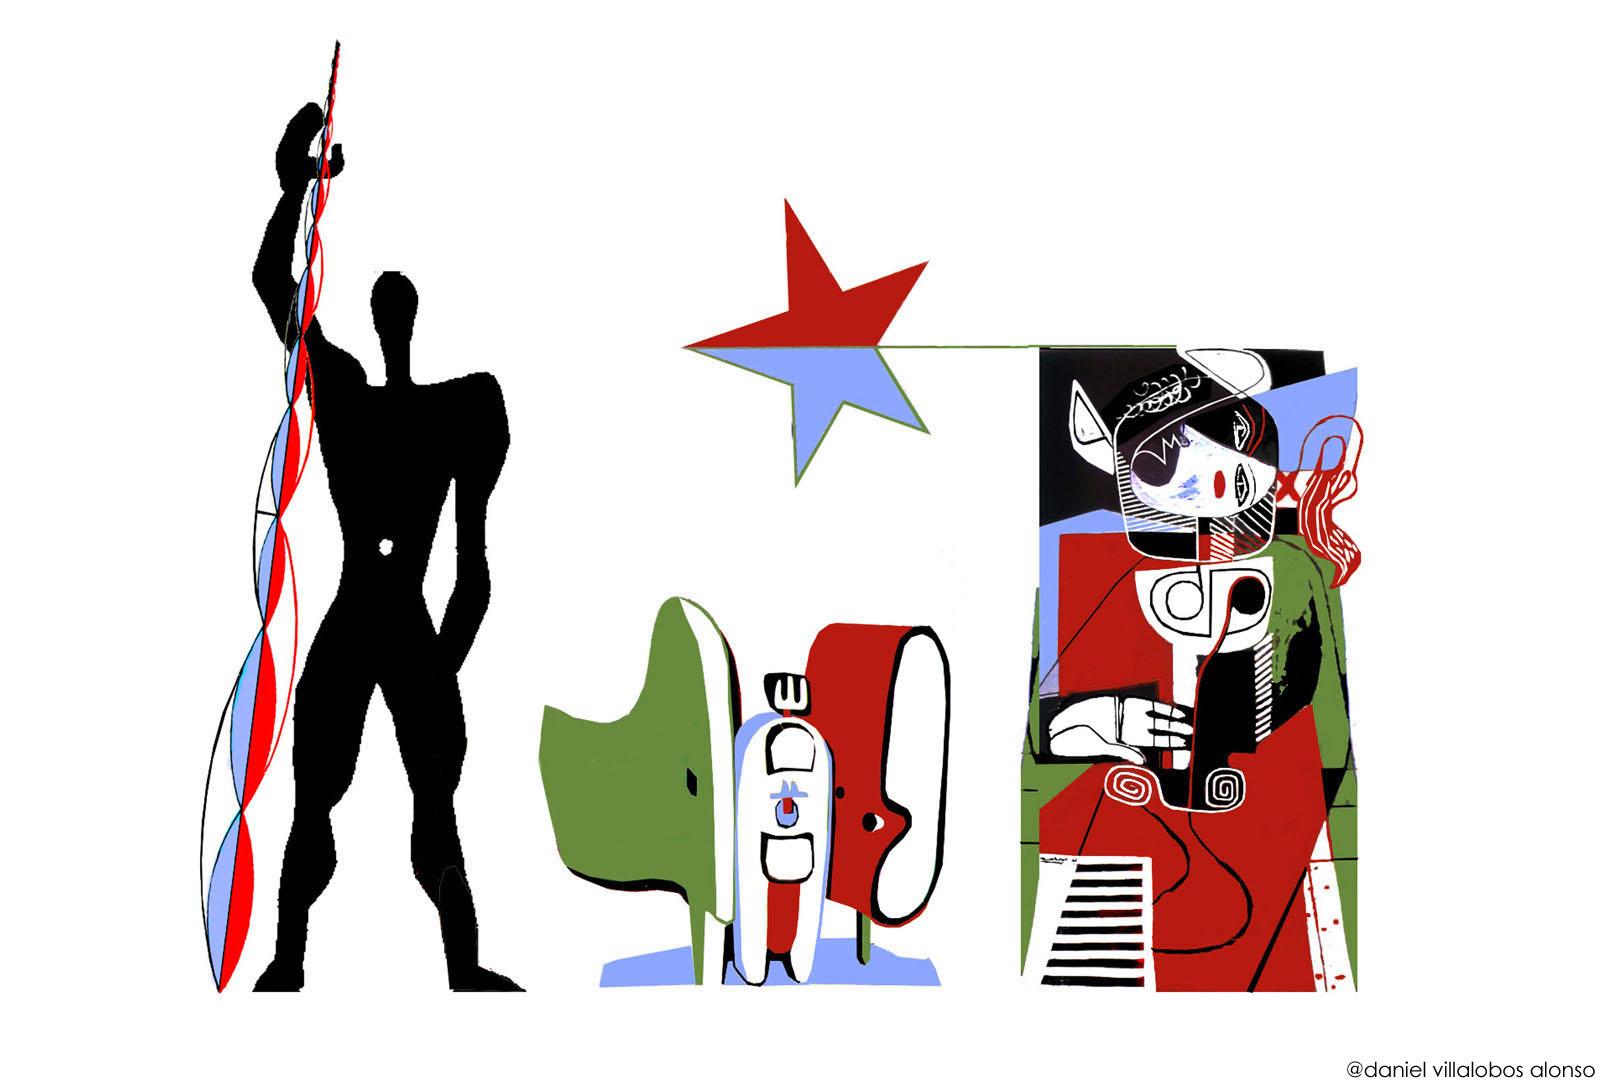 danielvillalobos-graphicdesign-lecorbusier-christmasgreetingcard-8